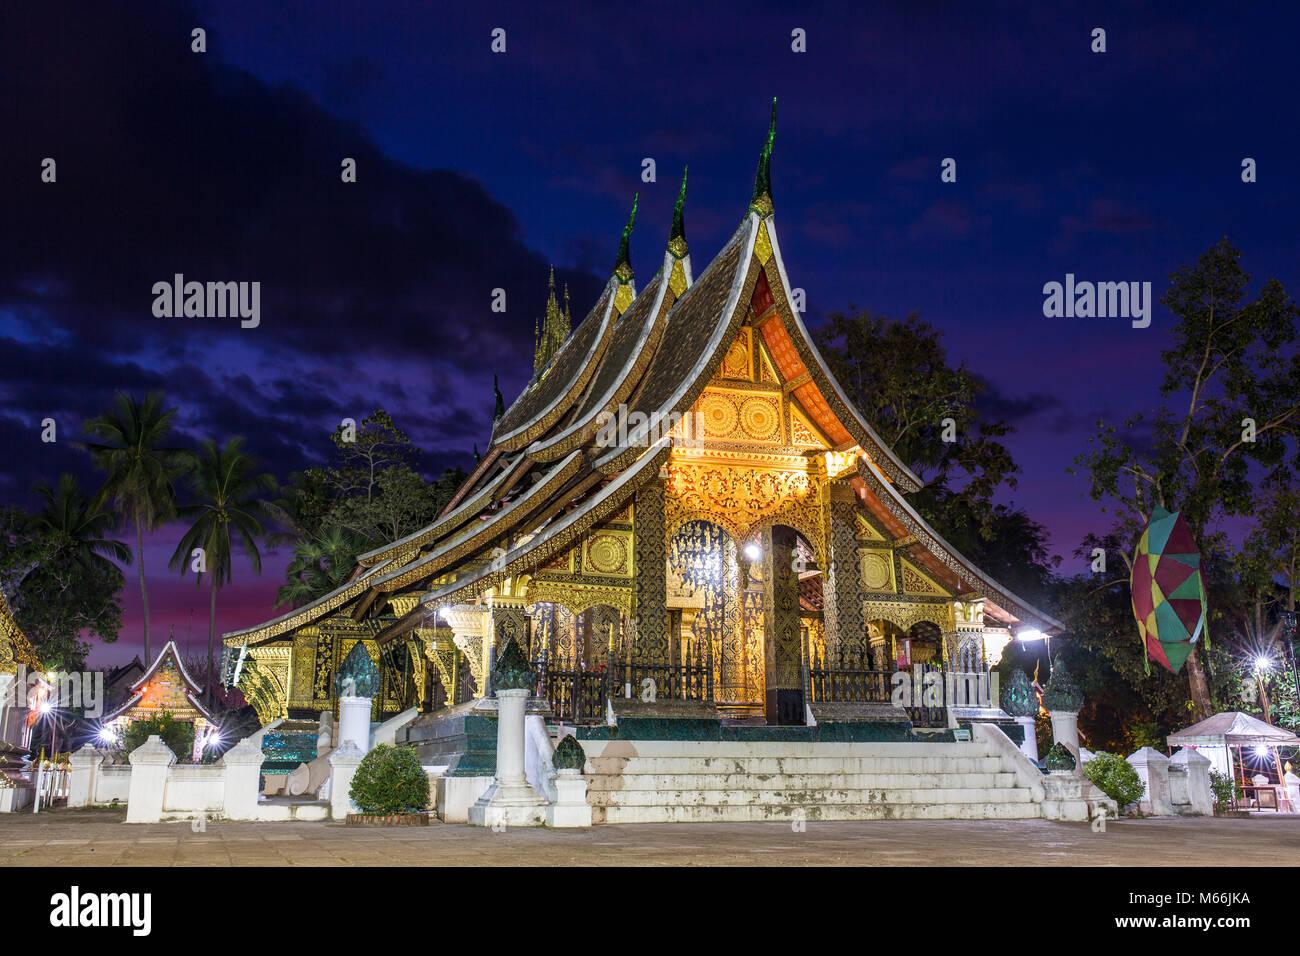 Wat Xieng Thong temple at night in Luang Prabang, Laos Stock Photo